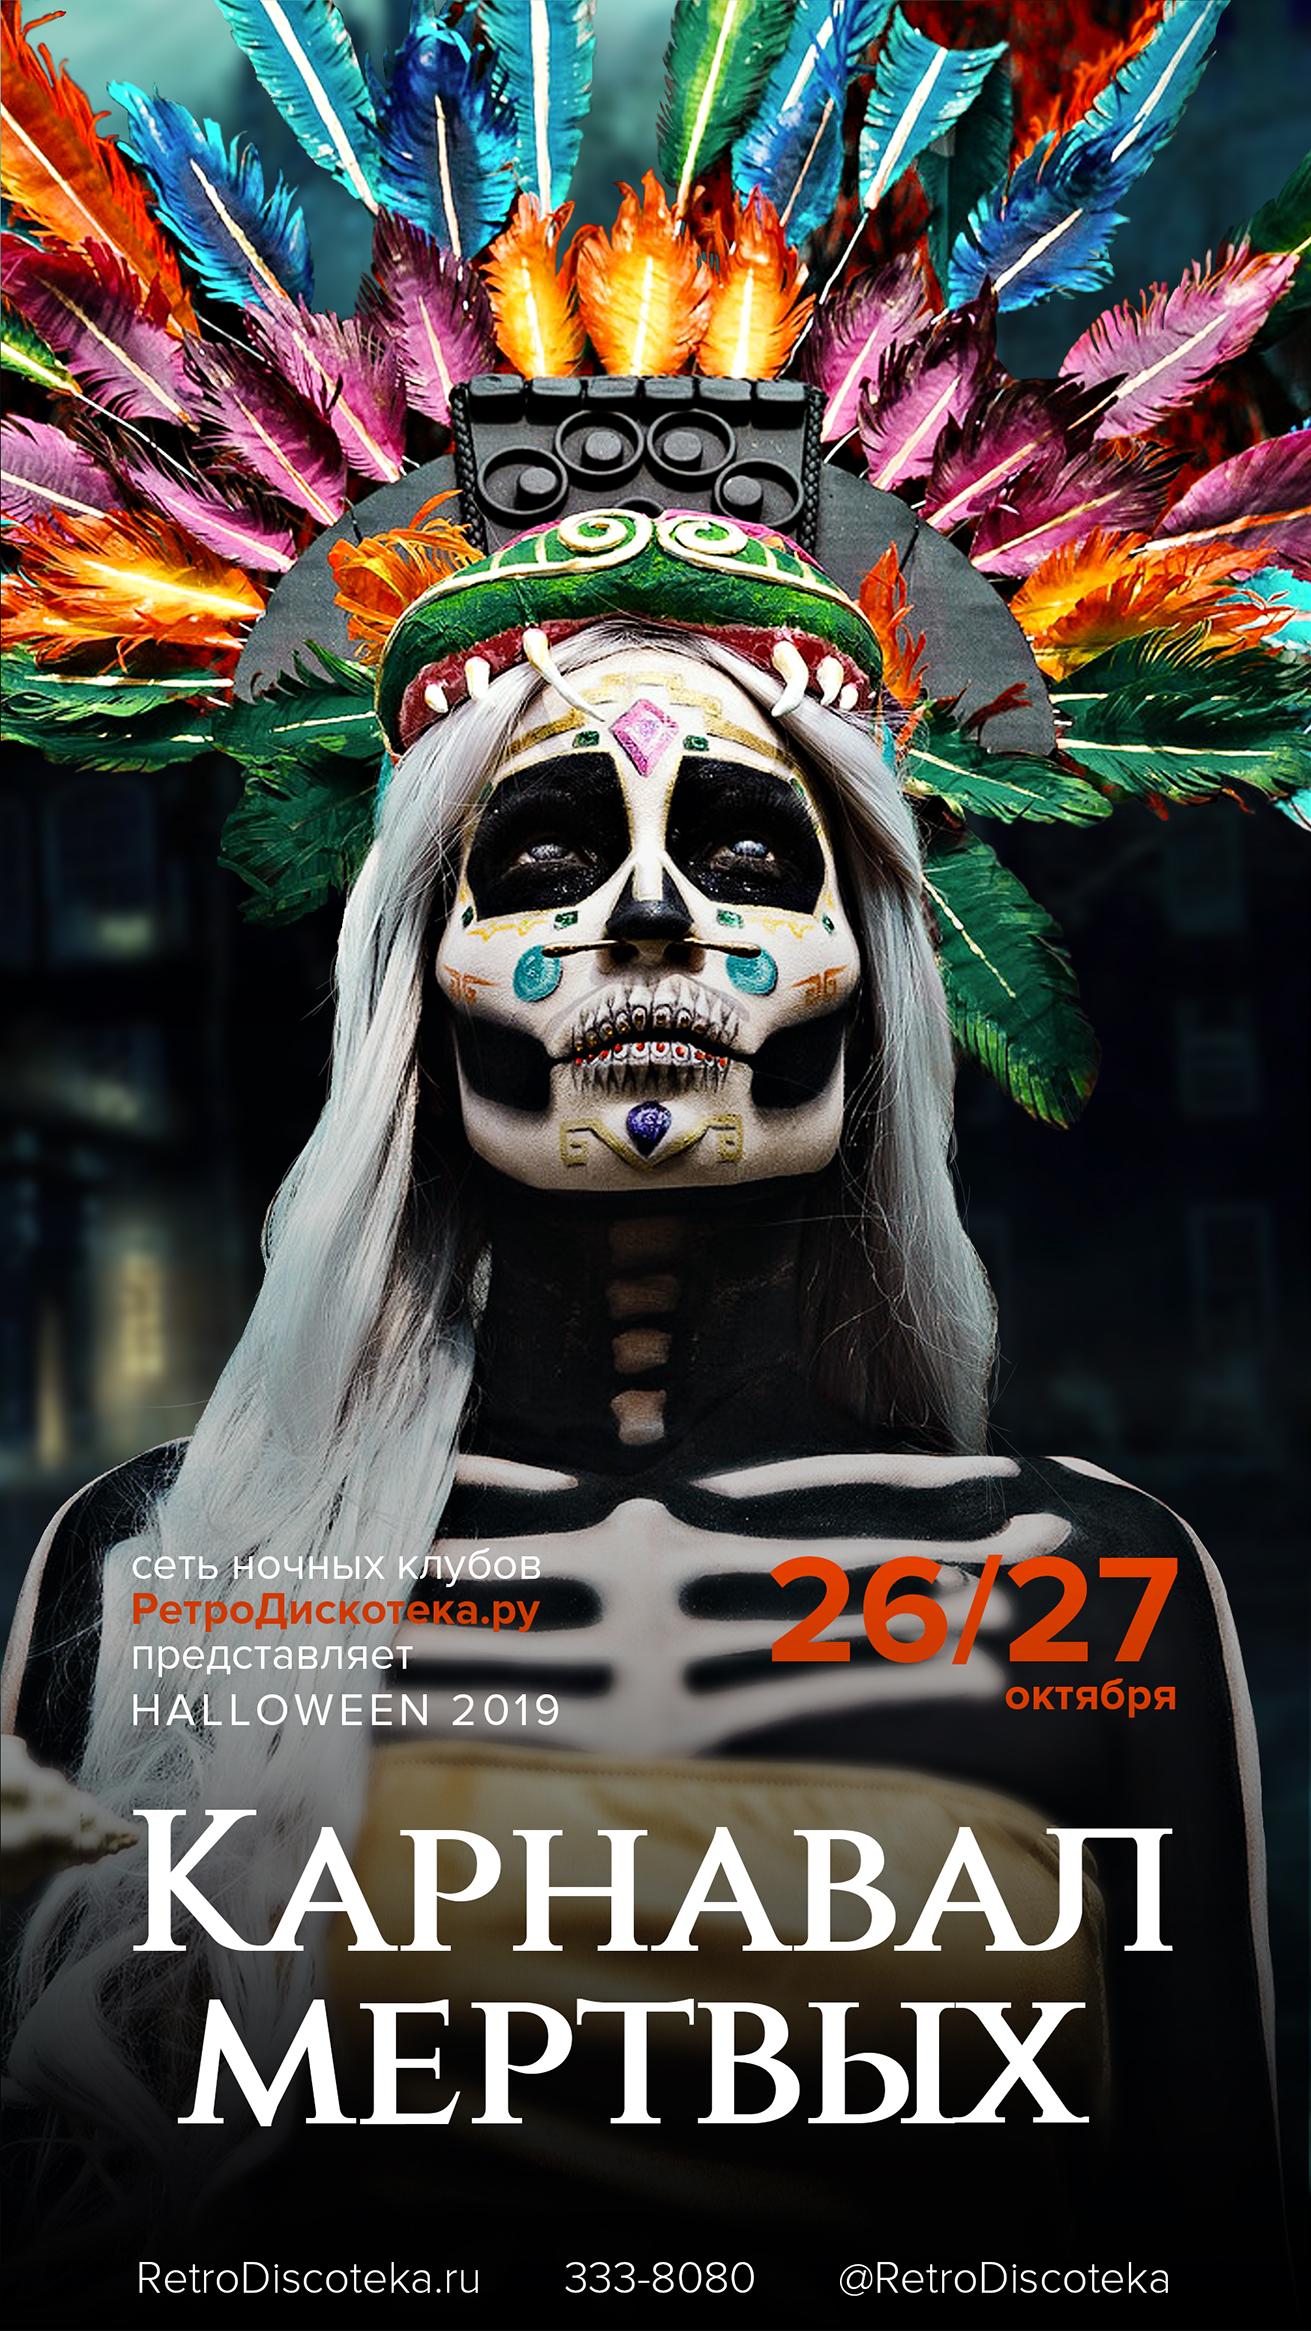 Дизайн афиши Хэллоуин 2019 для сети ночных клубов фото f_0765c641373da9fd.jpg